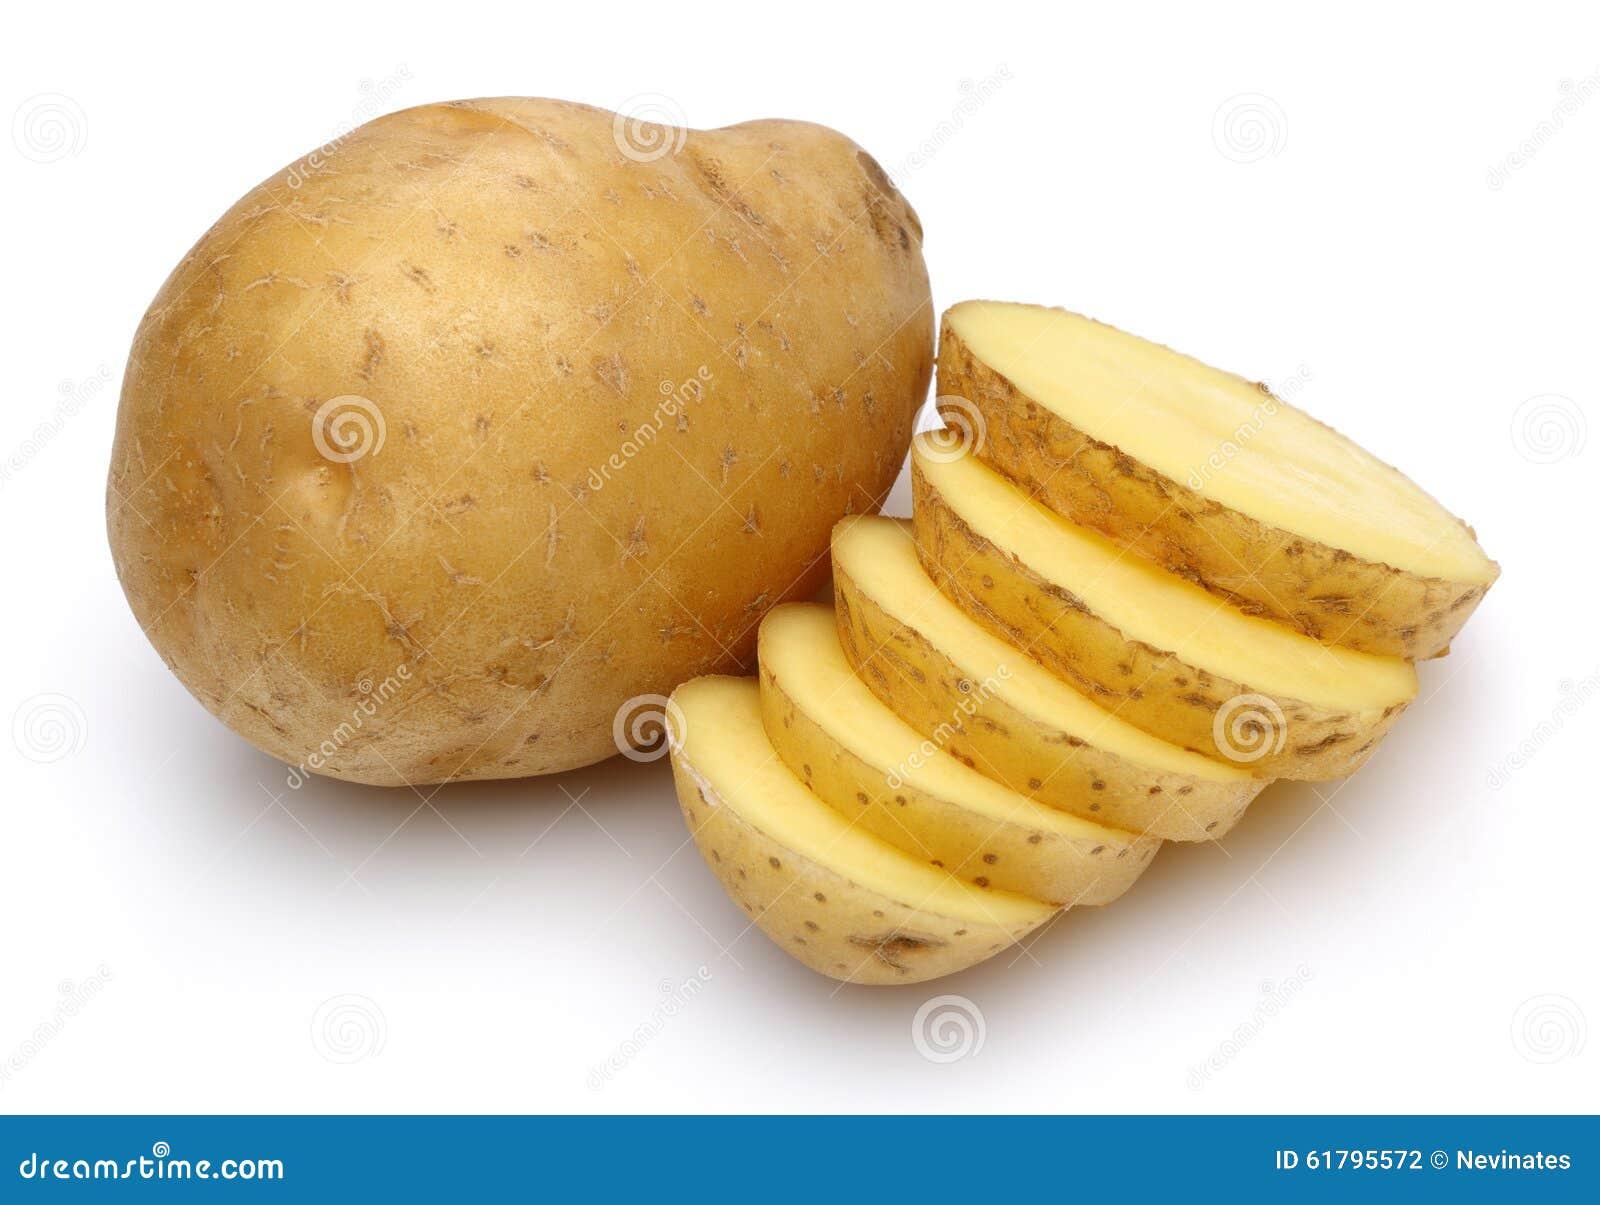 Patate crude e patate affettate